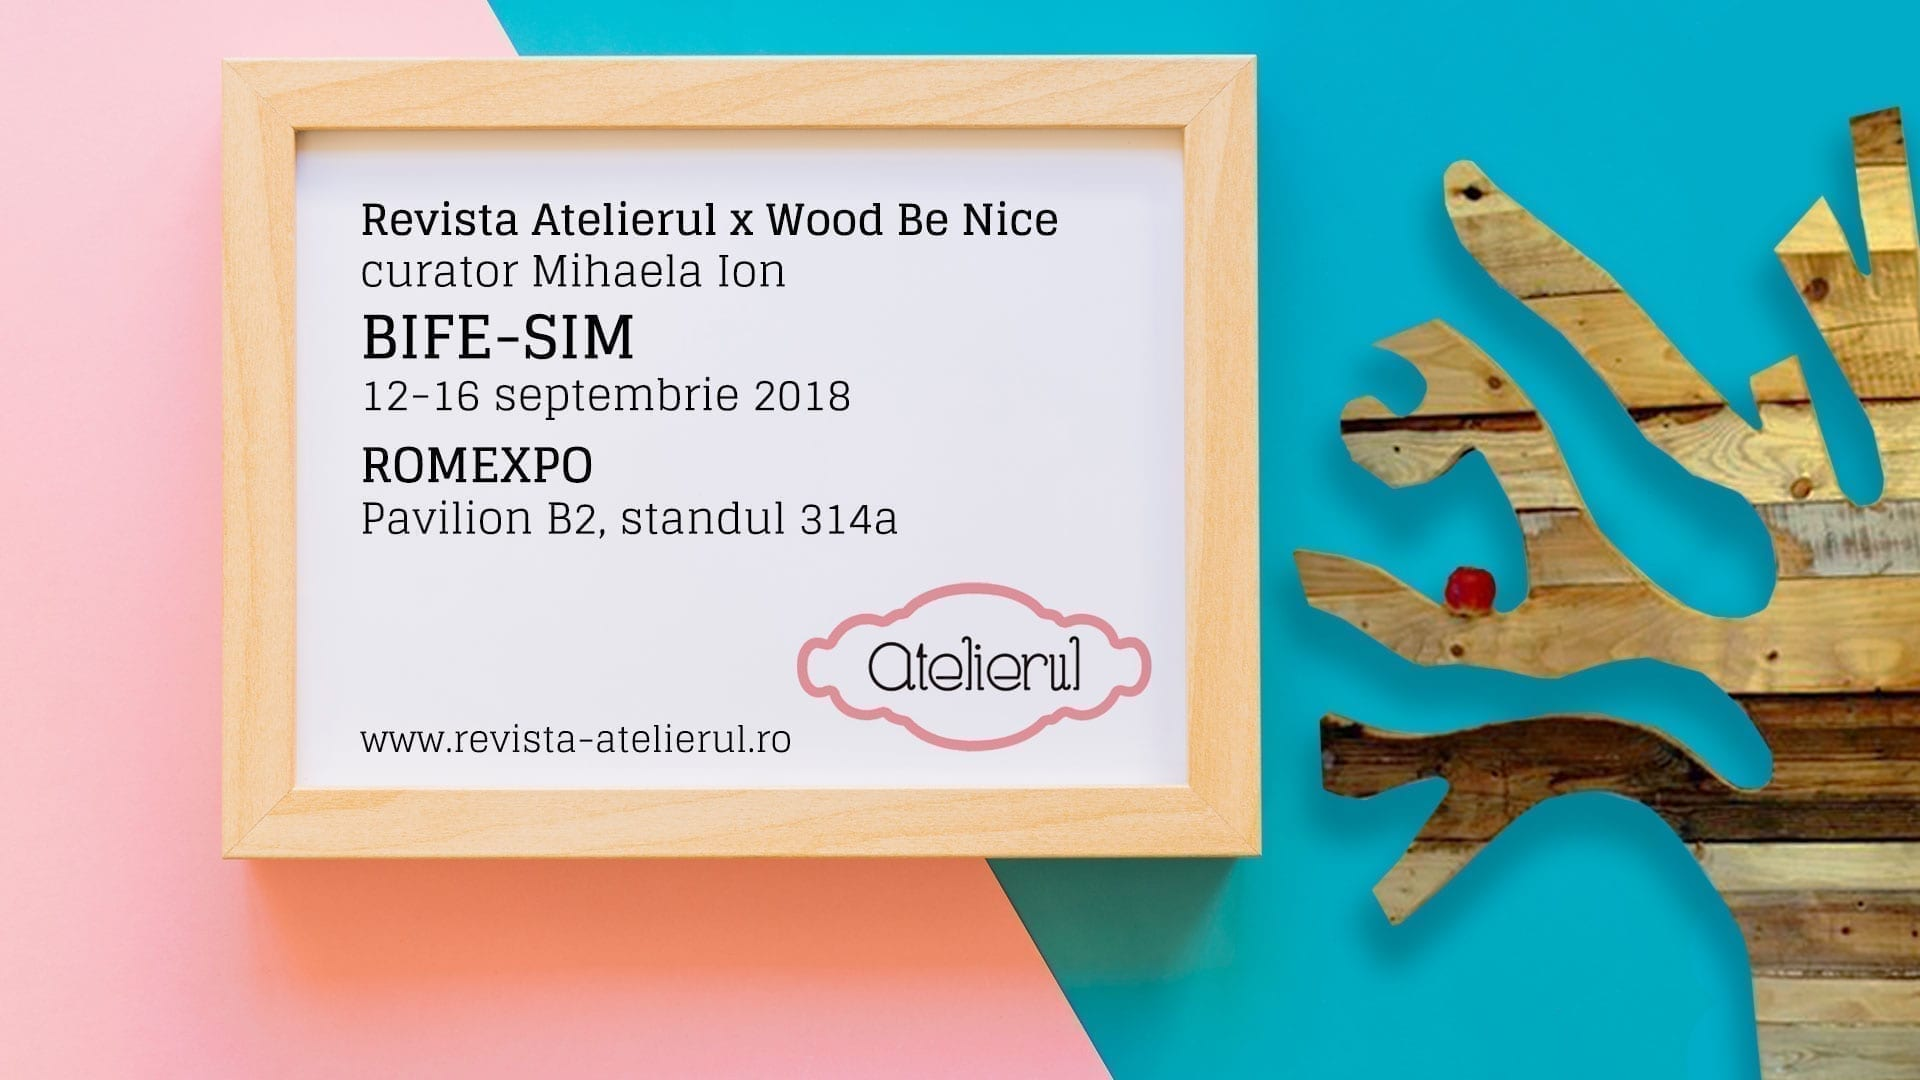 Revista Atelierul x Wood Be Nice